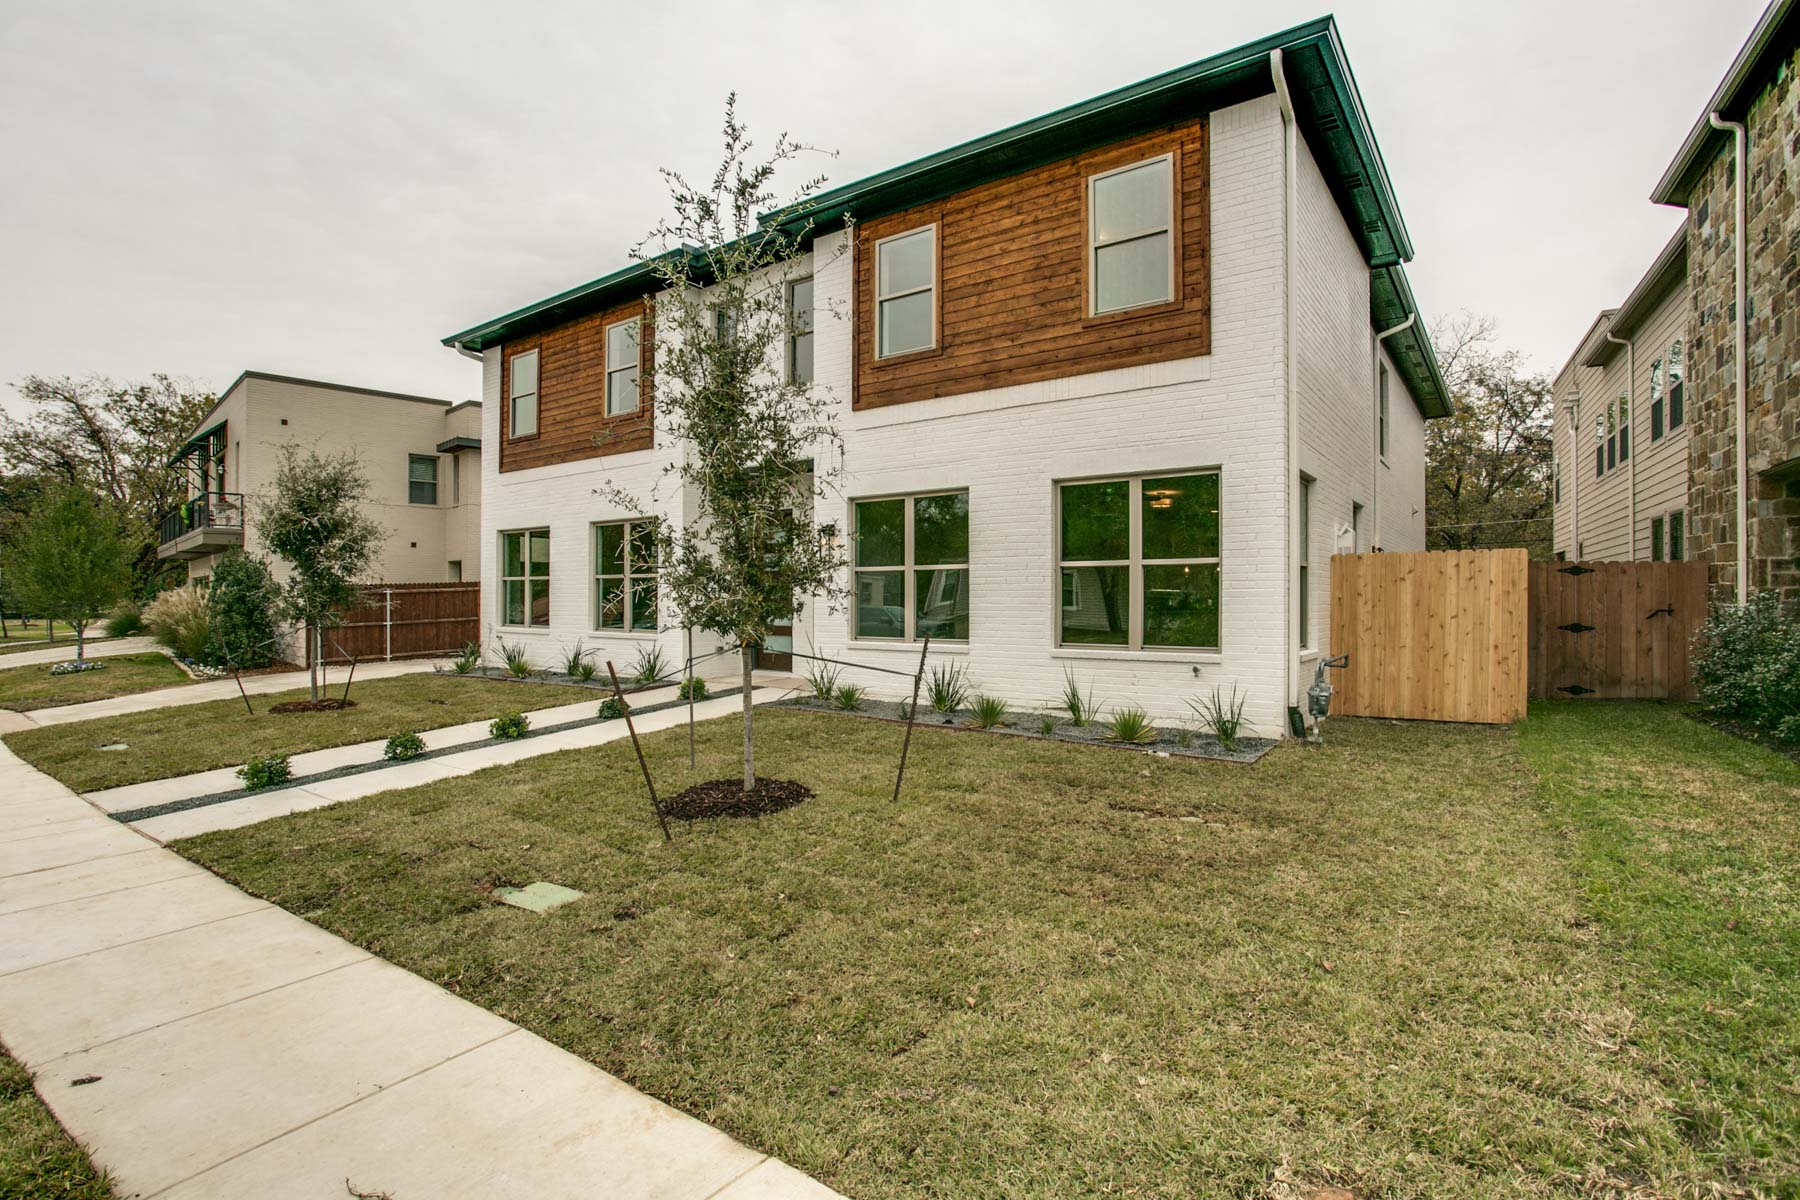 Villetta a schiera per Vendita alle ore 405 Wimberly Street, Fort Worth Fort Worth, Texas, 76107 Stati Uniti